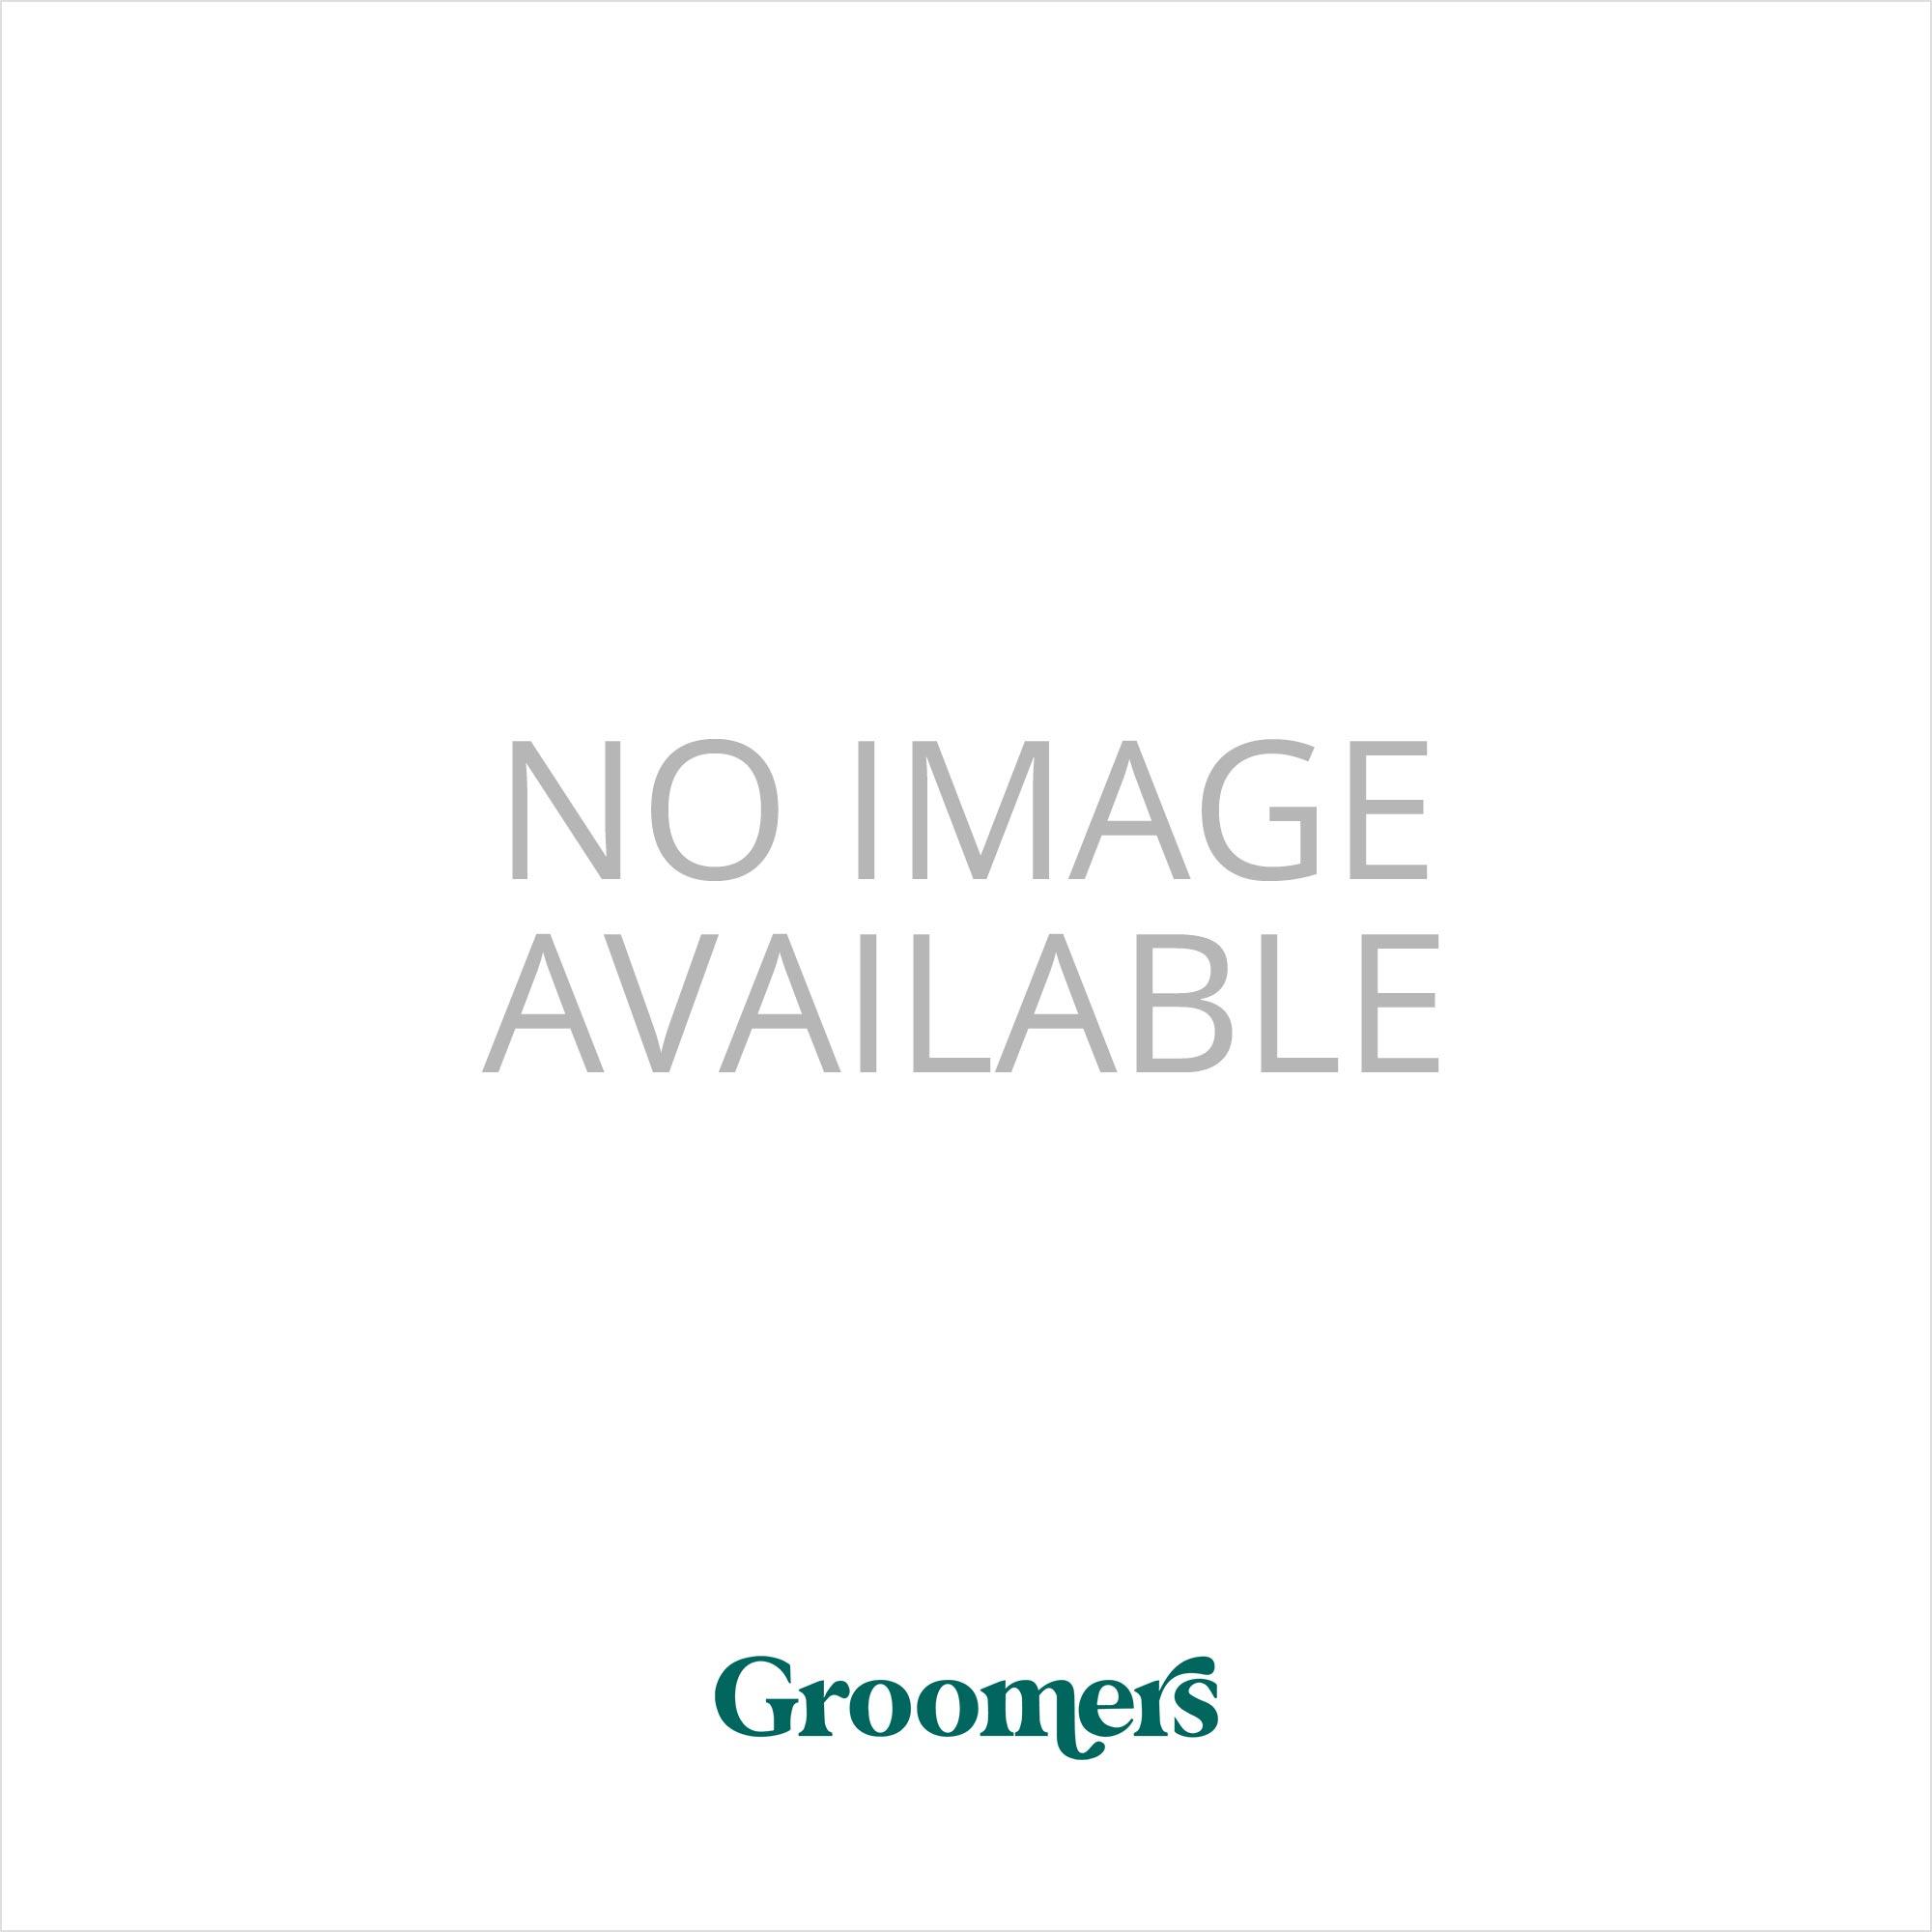 Groomers Fantasia Spray - Retail